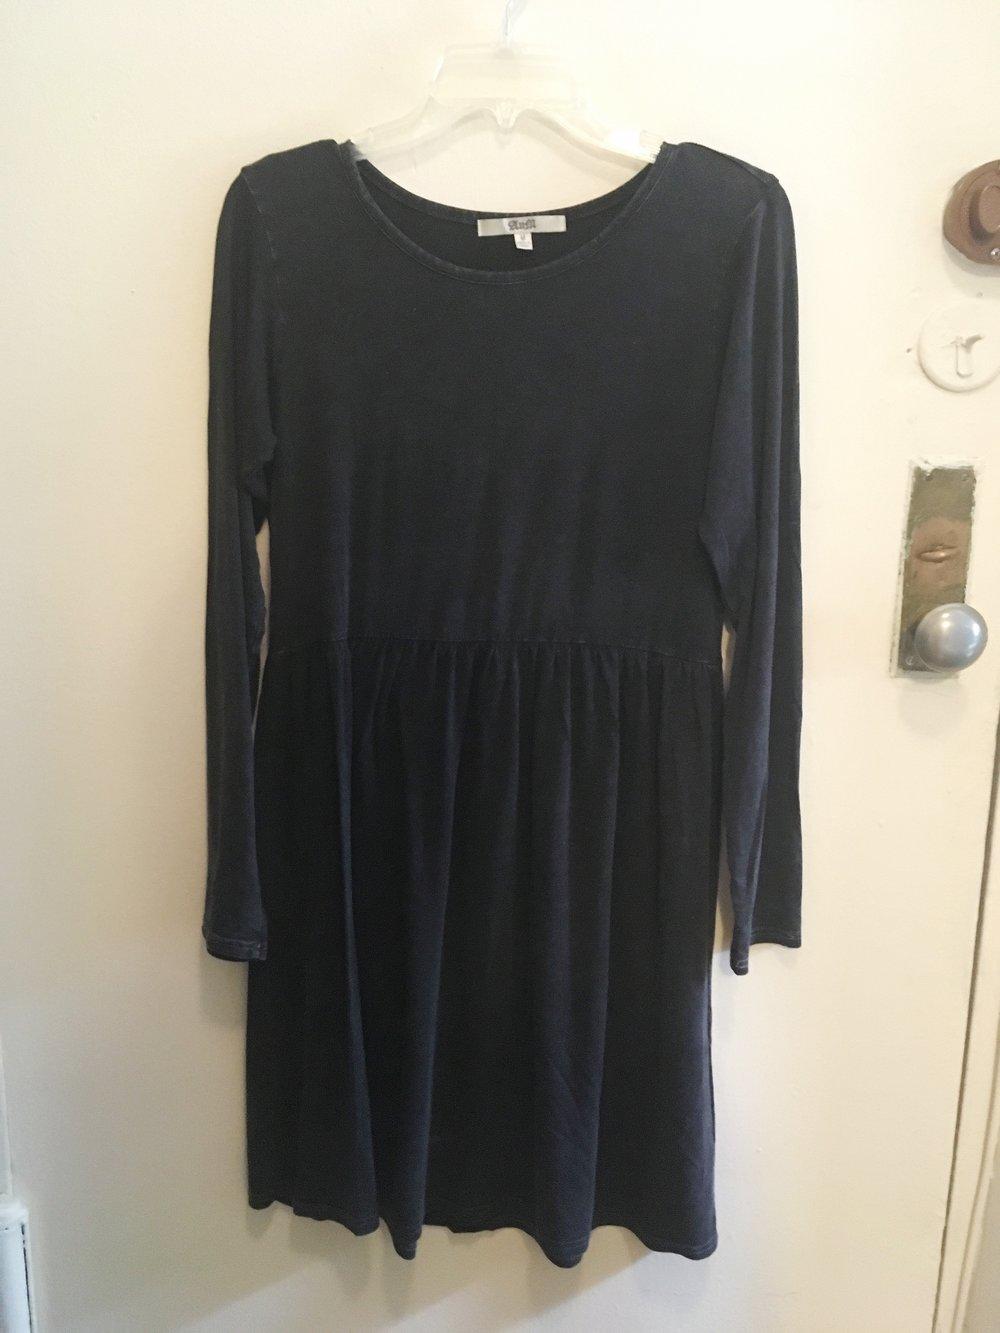 Charcoal Sleeve Dress, $15